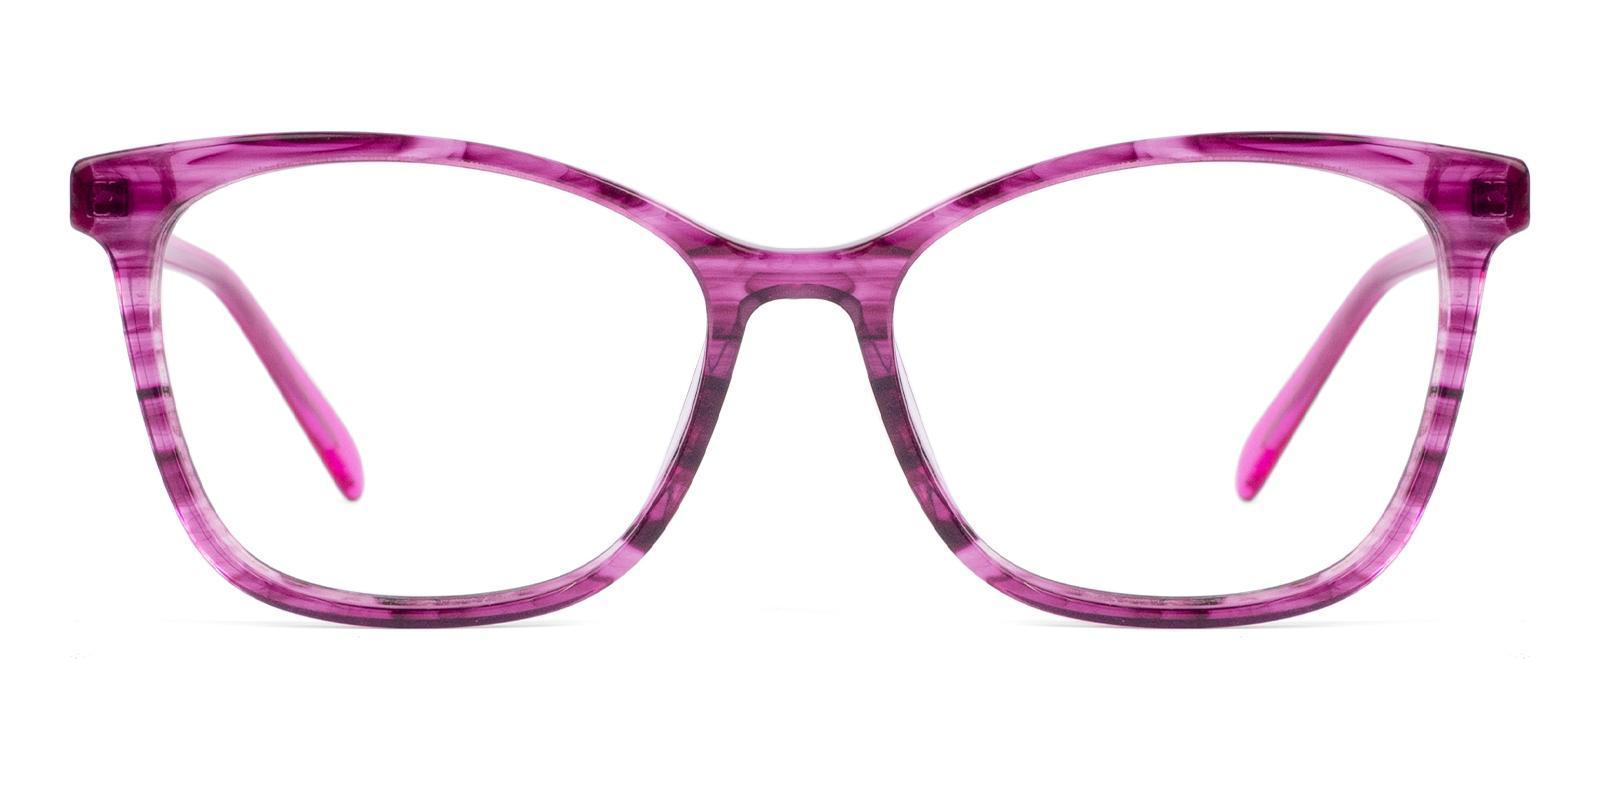 Coliny Pink Acetate Eyeglasses , Fashion , SpringHinges , UniversalBridgeFit Frames from ABBE Glasses